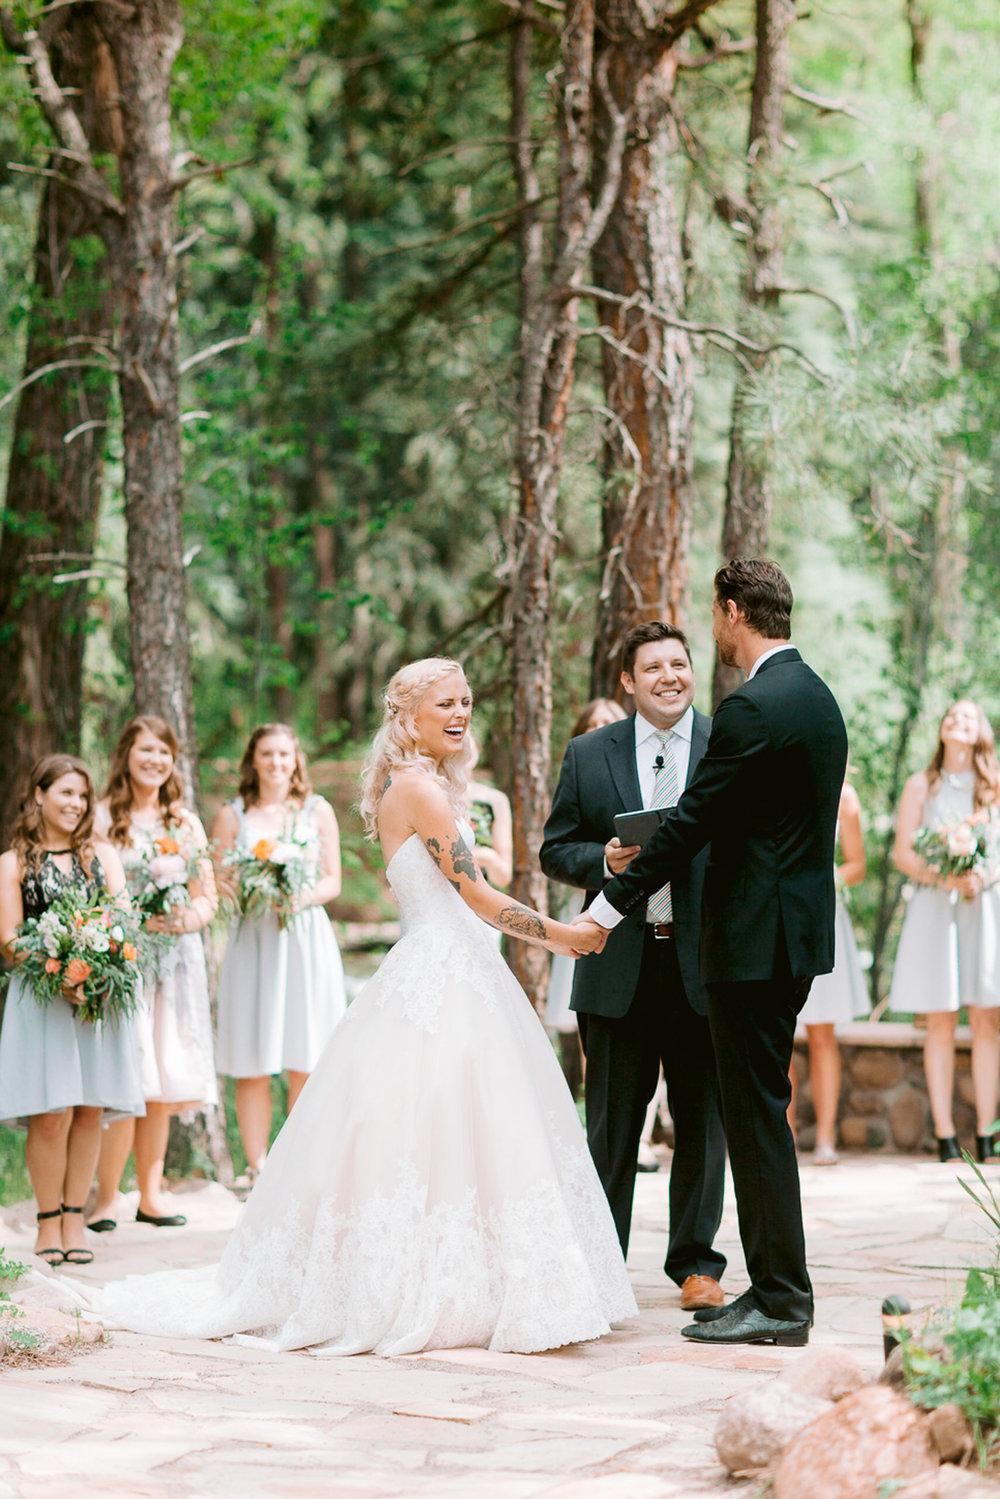 durango-intimate-family-wedding-private-ranch-022.jpg